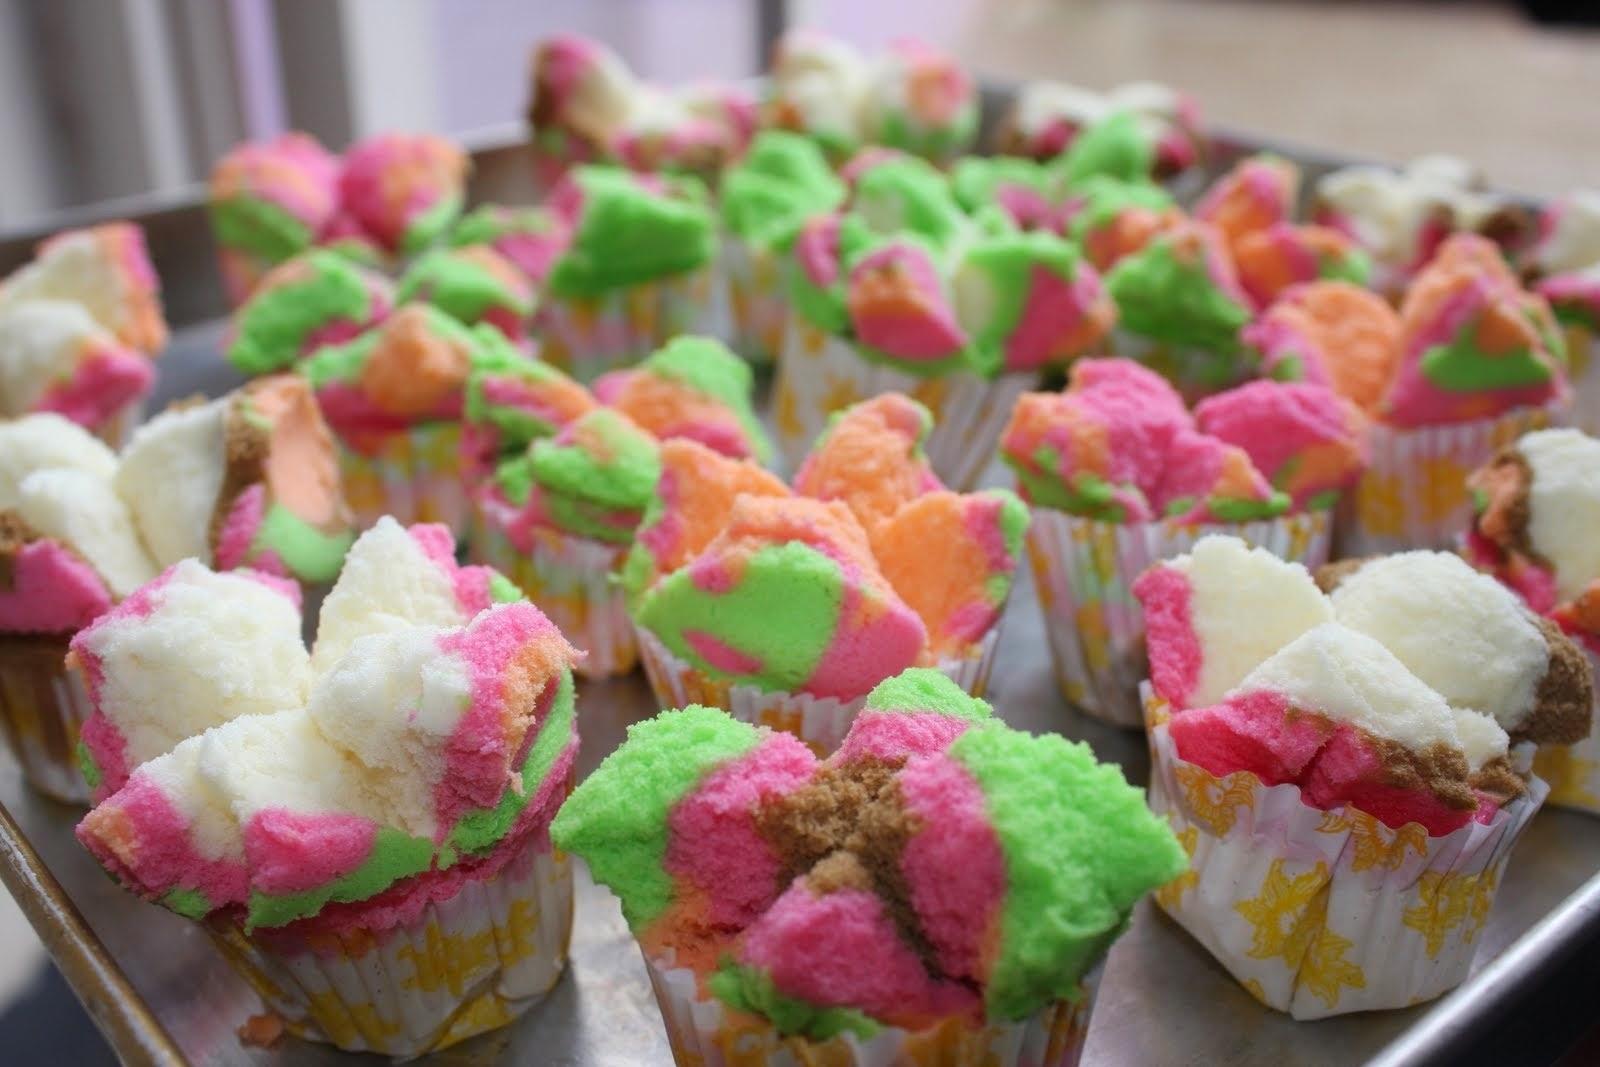 MeiGiaNa bLog: 5 Kue Tradisional Indonesia Ternikmat